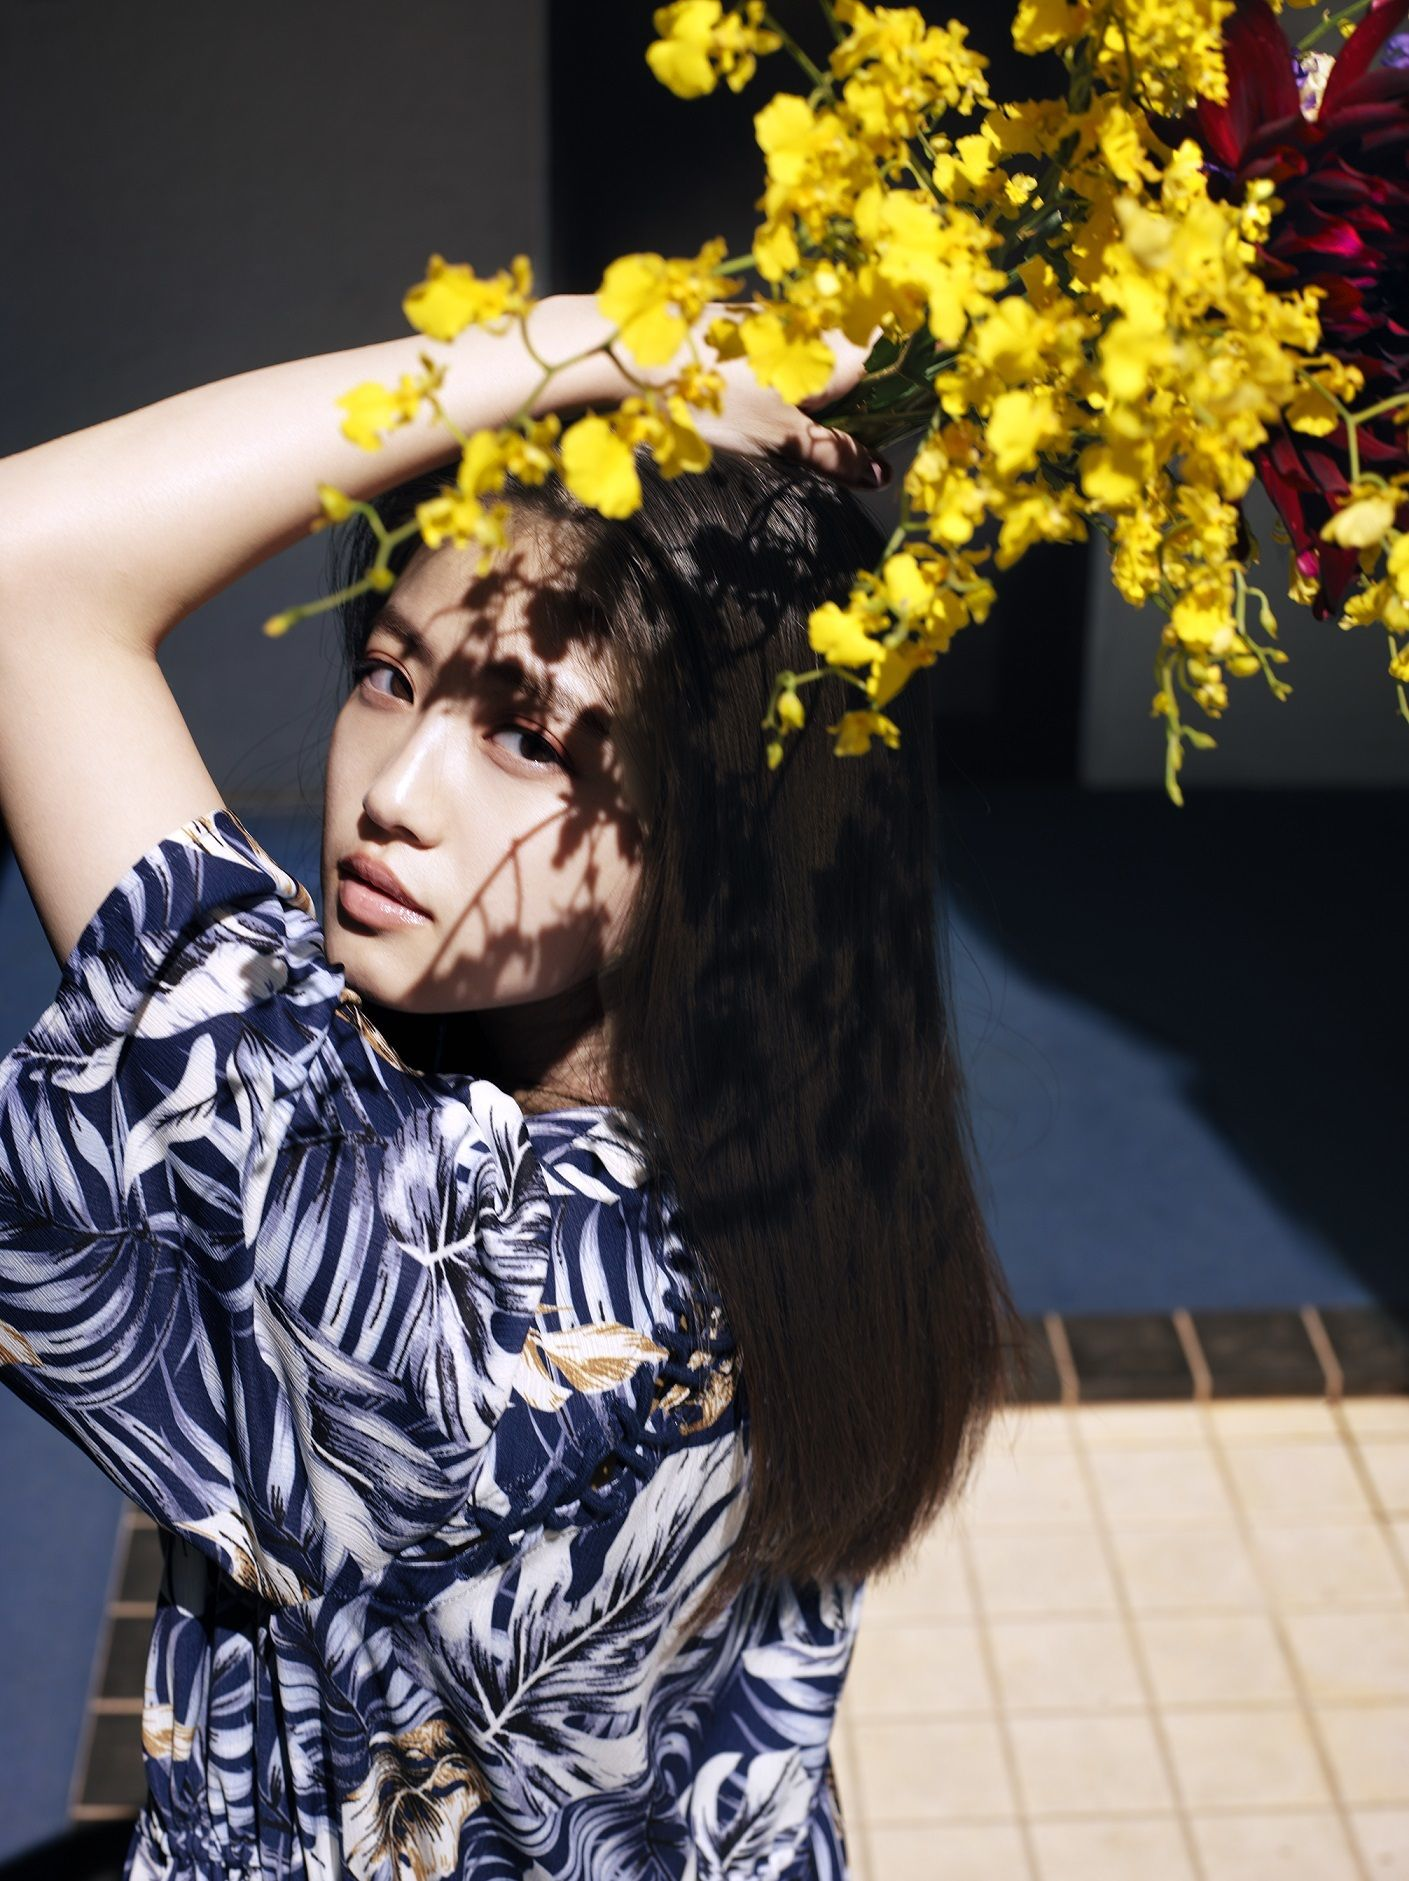 「EMODA」2019summerカタログの今田美桜